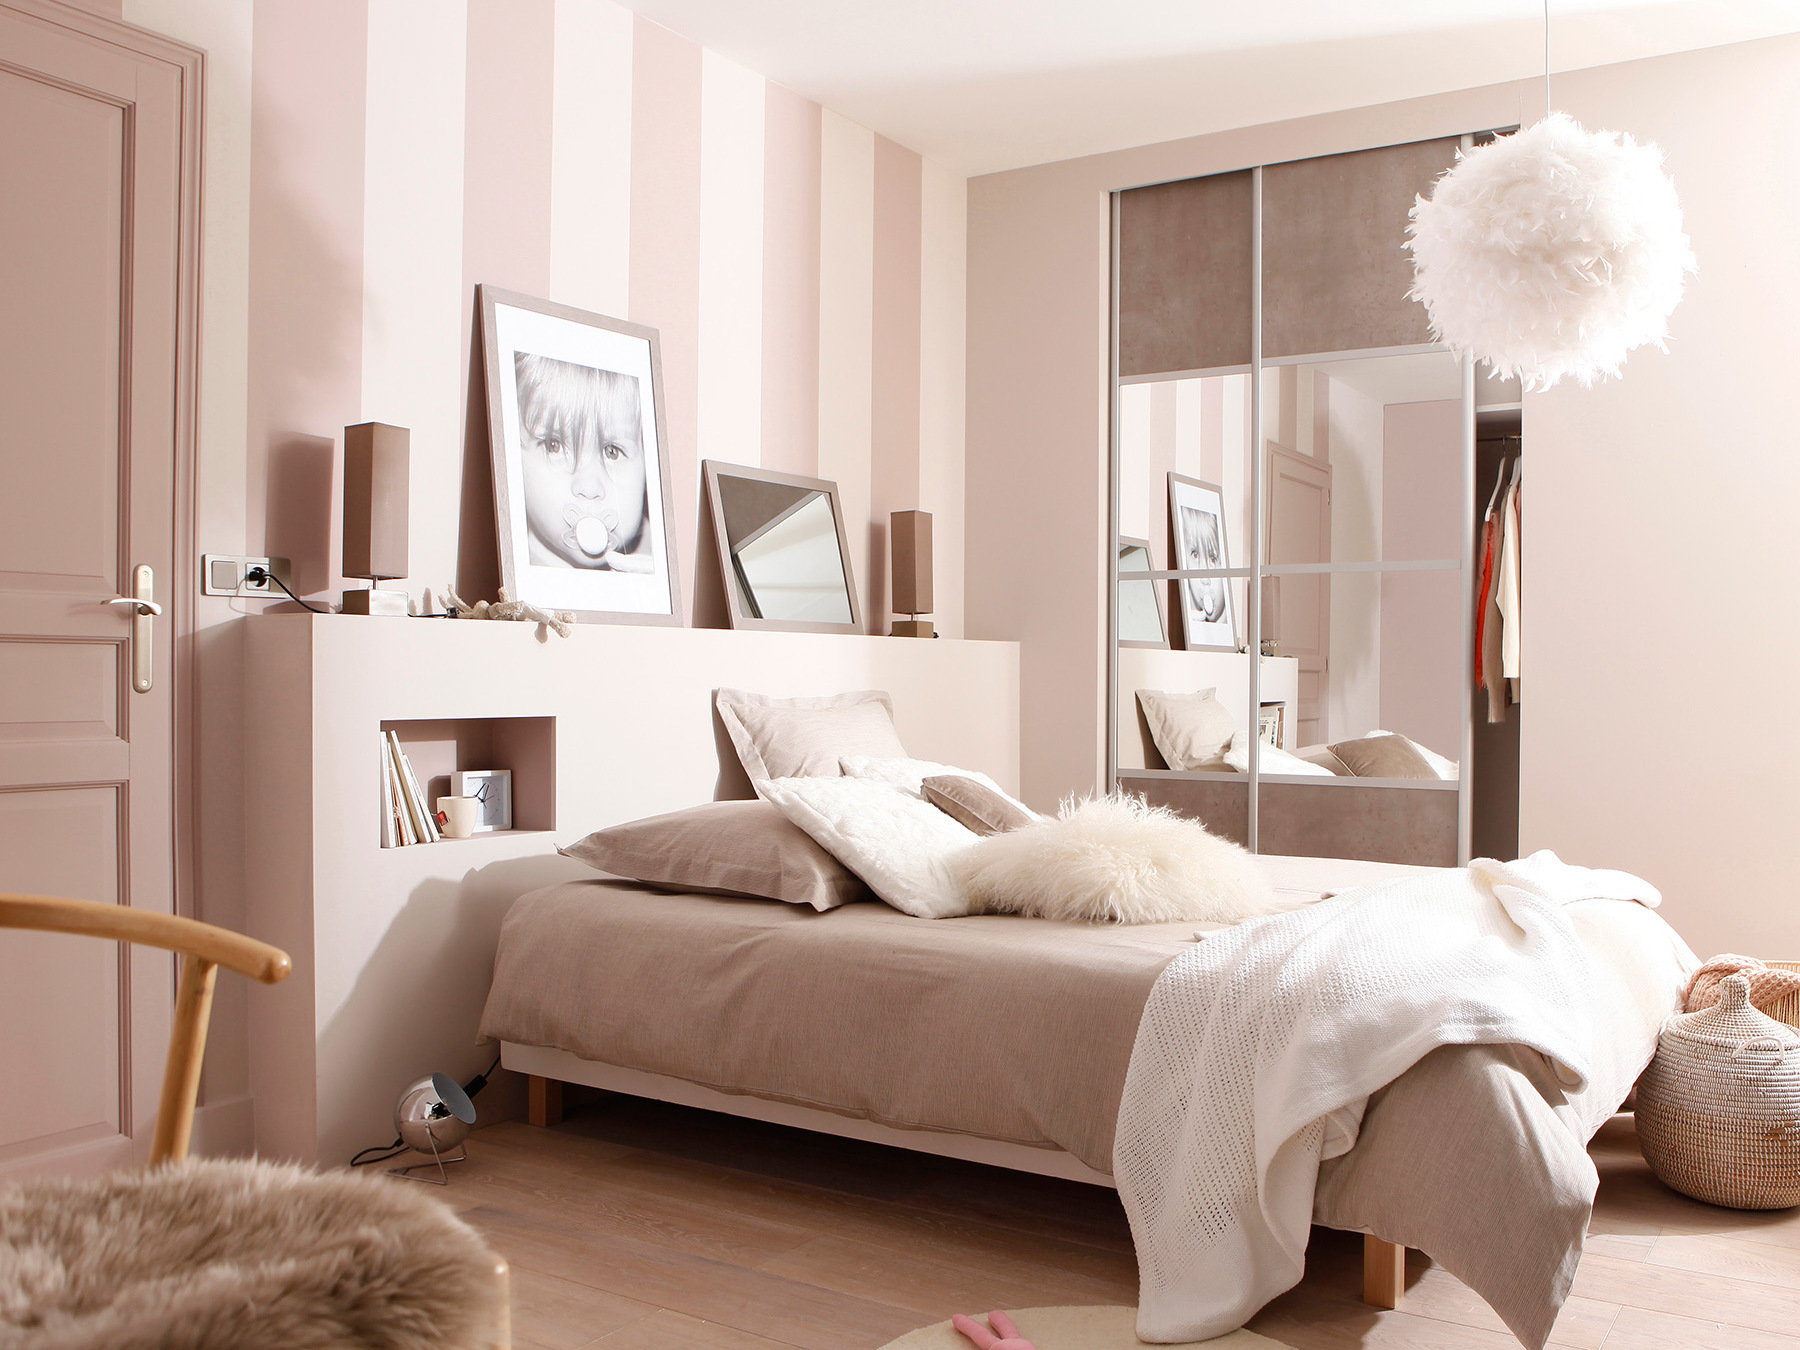 plafonnier boule plume design en image. Black Bedroom Furniture Sets. Home Design Ideas